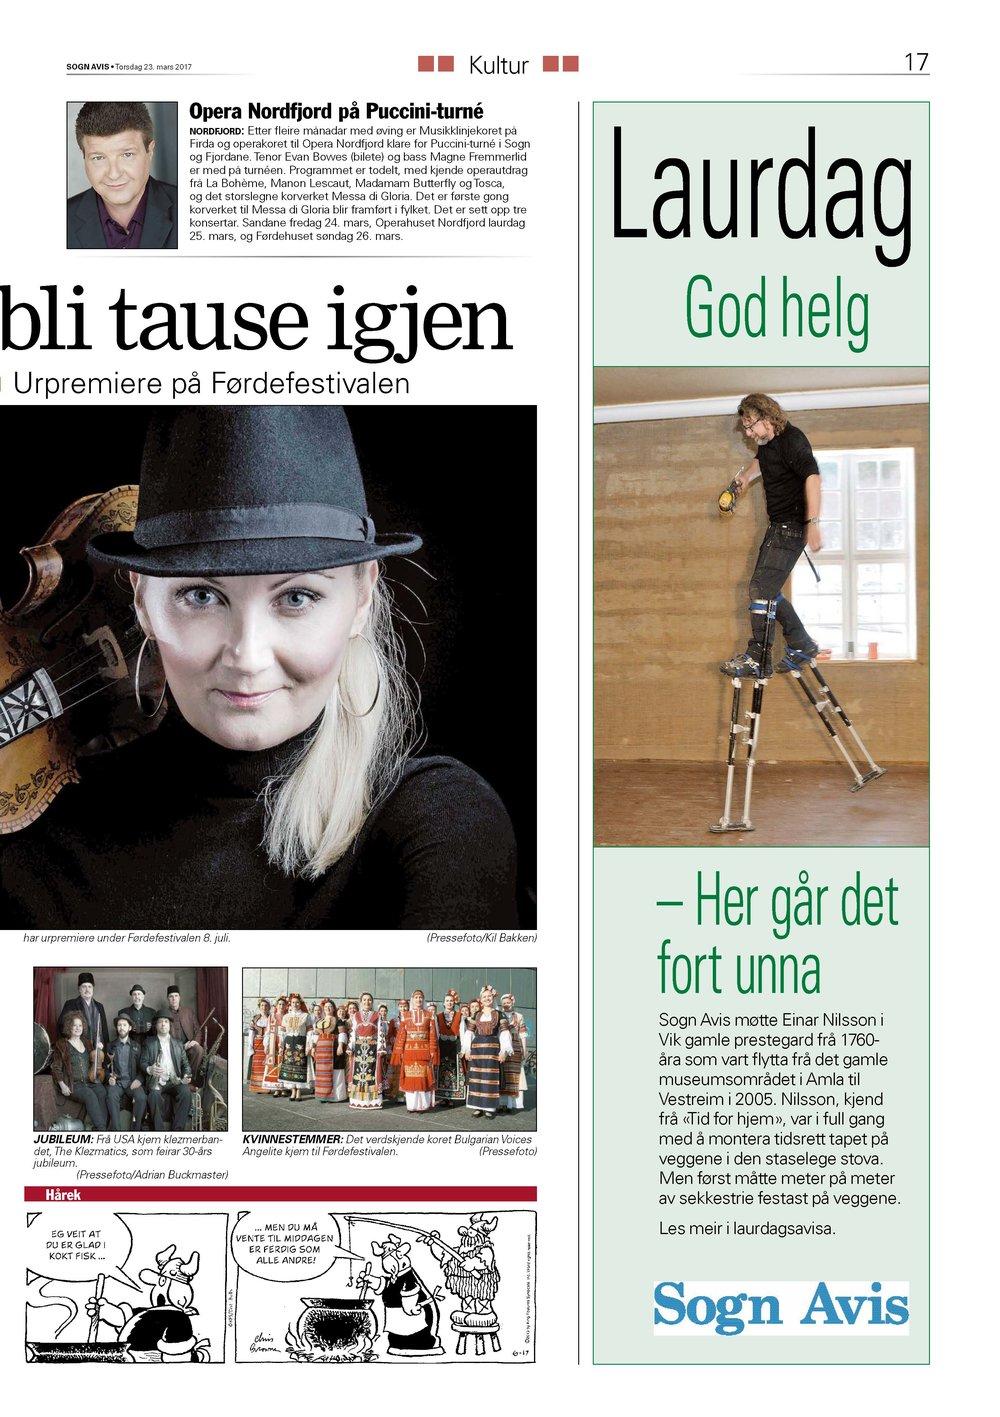 Sogn-Avis-2017-03-23-side-17 - Programslepp - Sigrid Moldestad.jpg